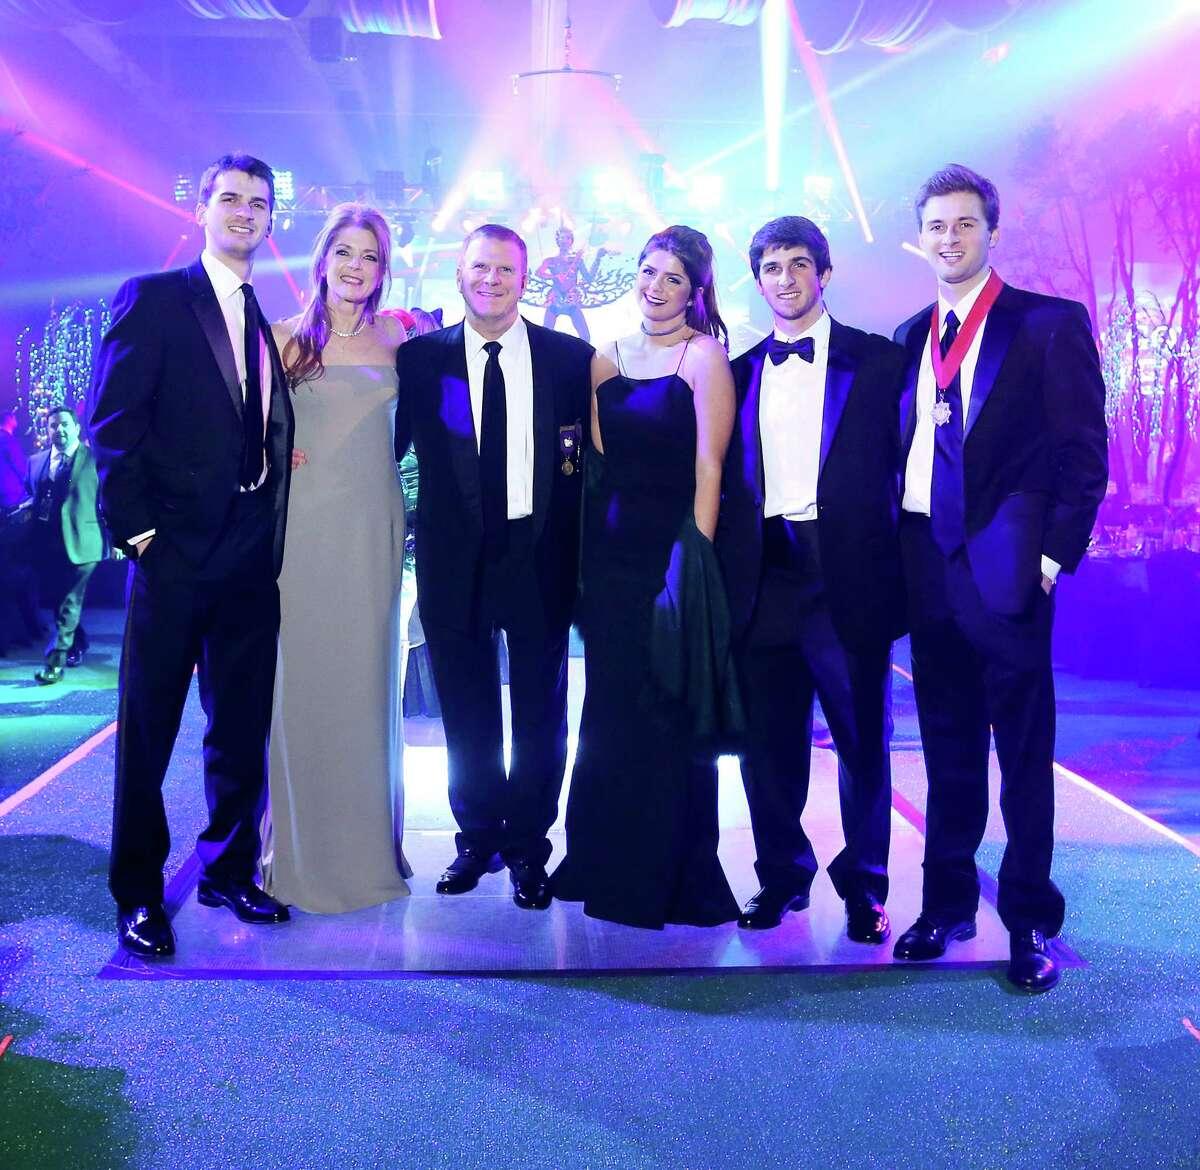 Michael, Paige, Tilman, Blayne, Blake and Patrick Fertitta